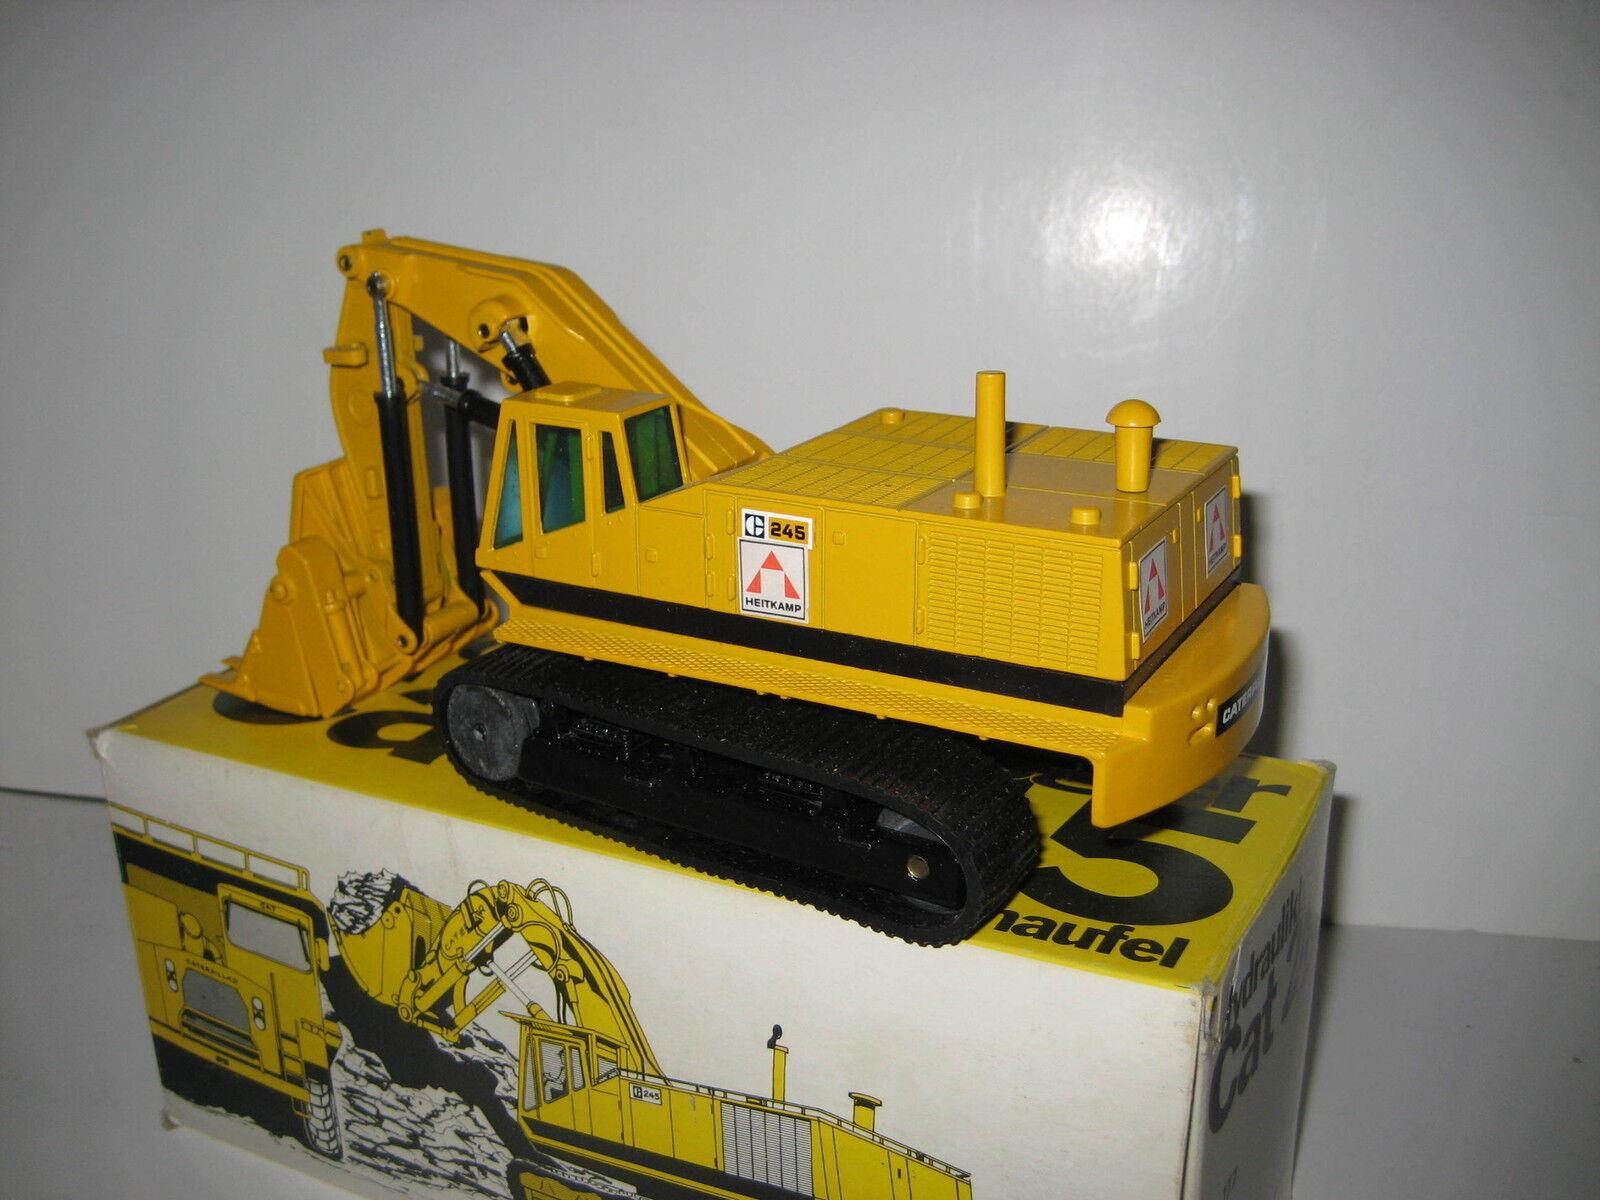 Caterpillar 245 excavadoras alta cuchara Heitkamp  177 NZG 1 50 OVP